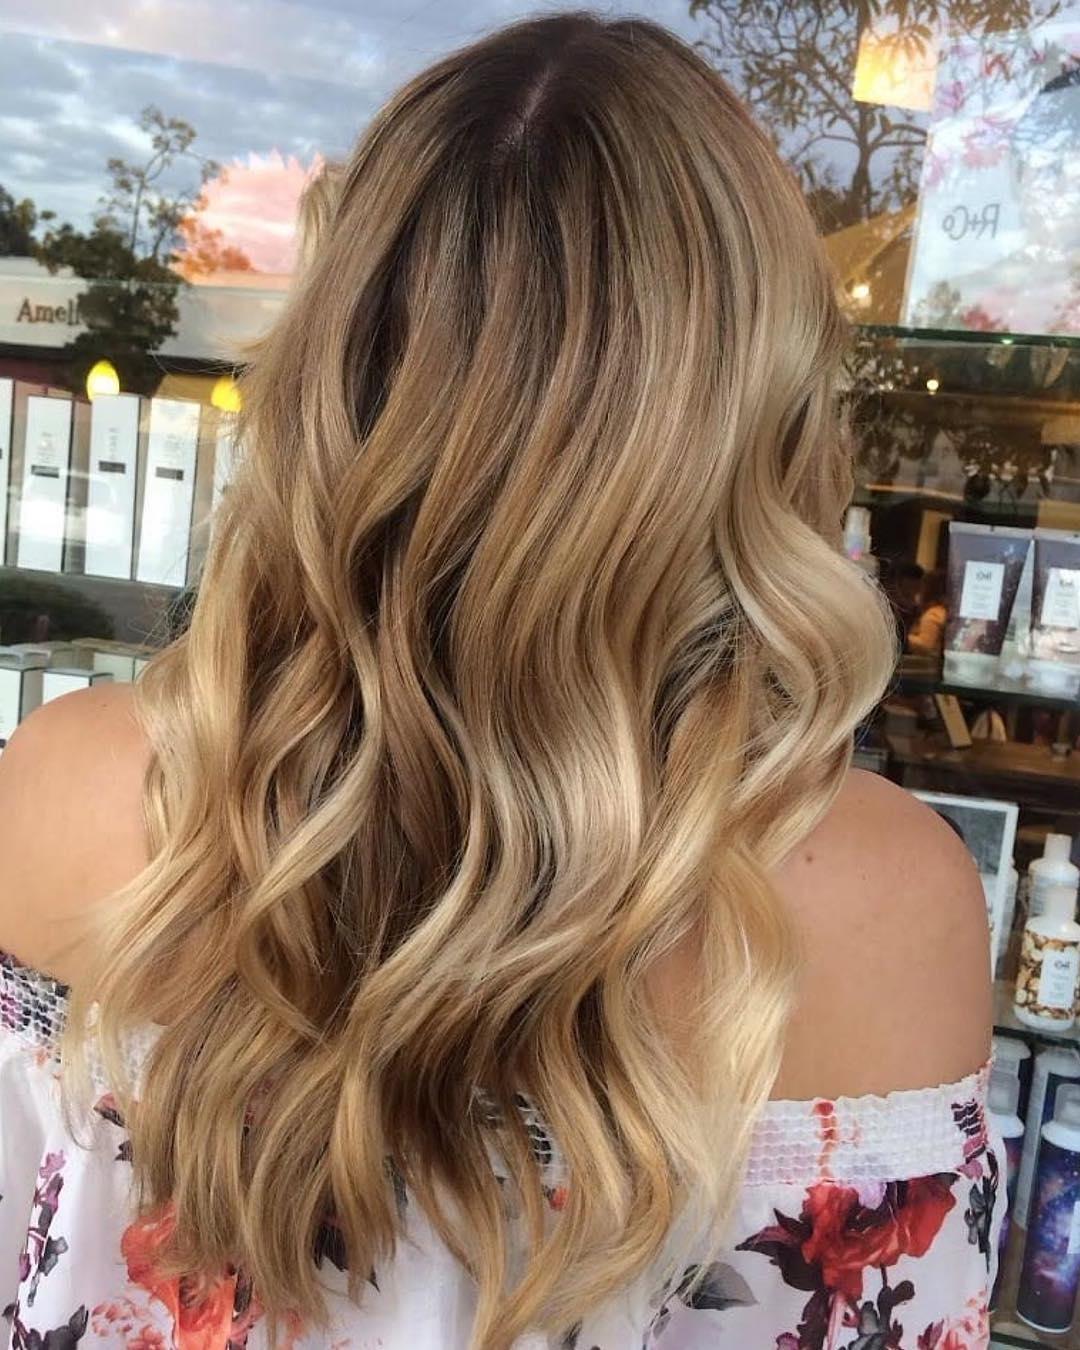 20 Caramel Highlights For Dark Brown Hair 2019 Short